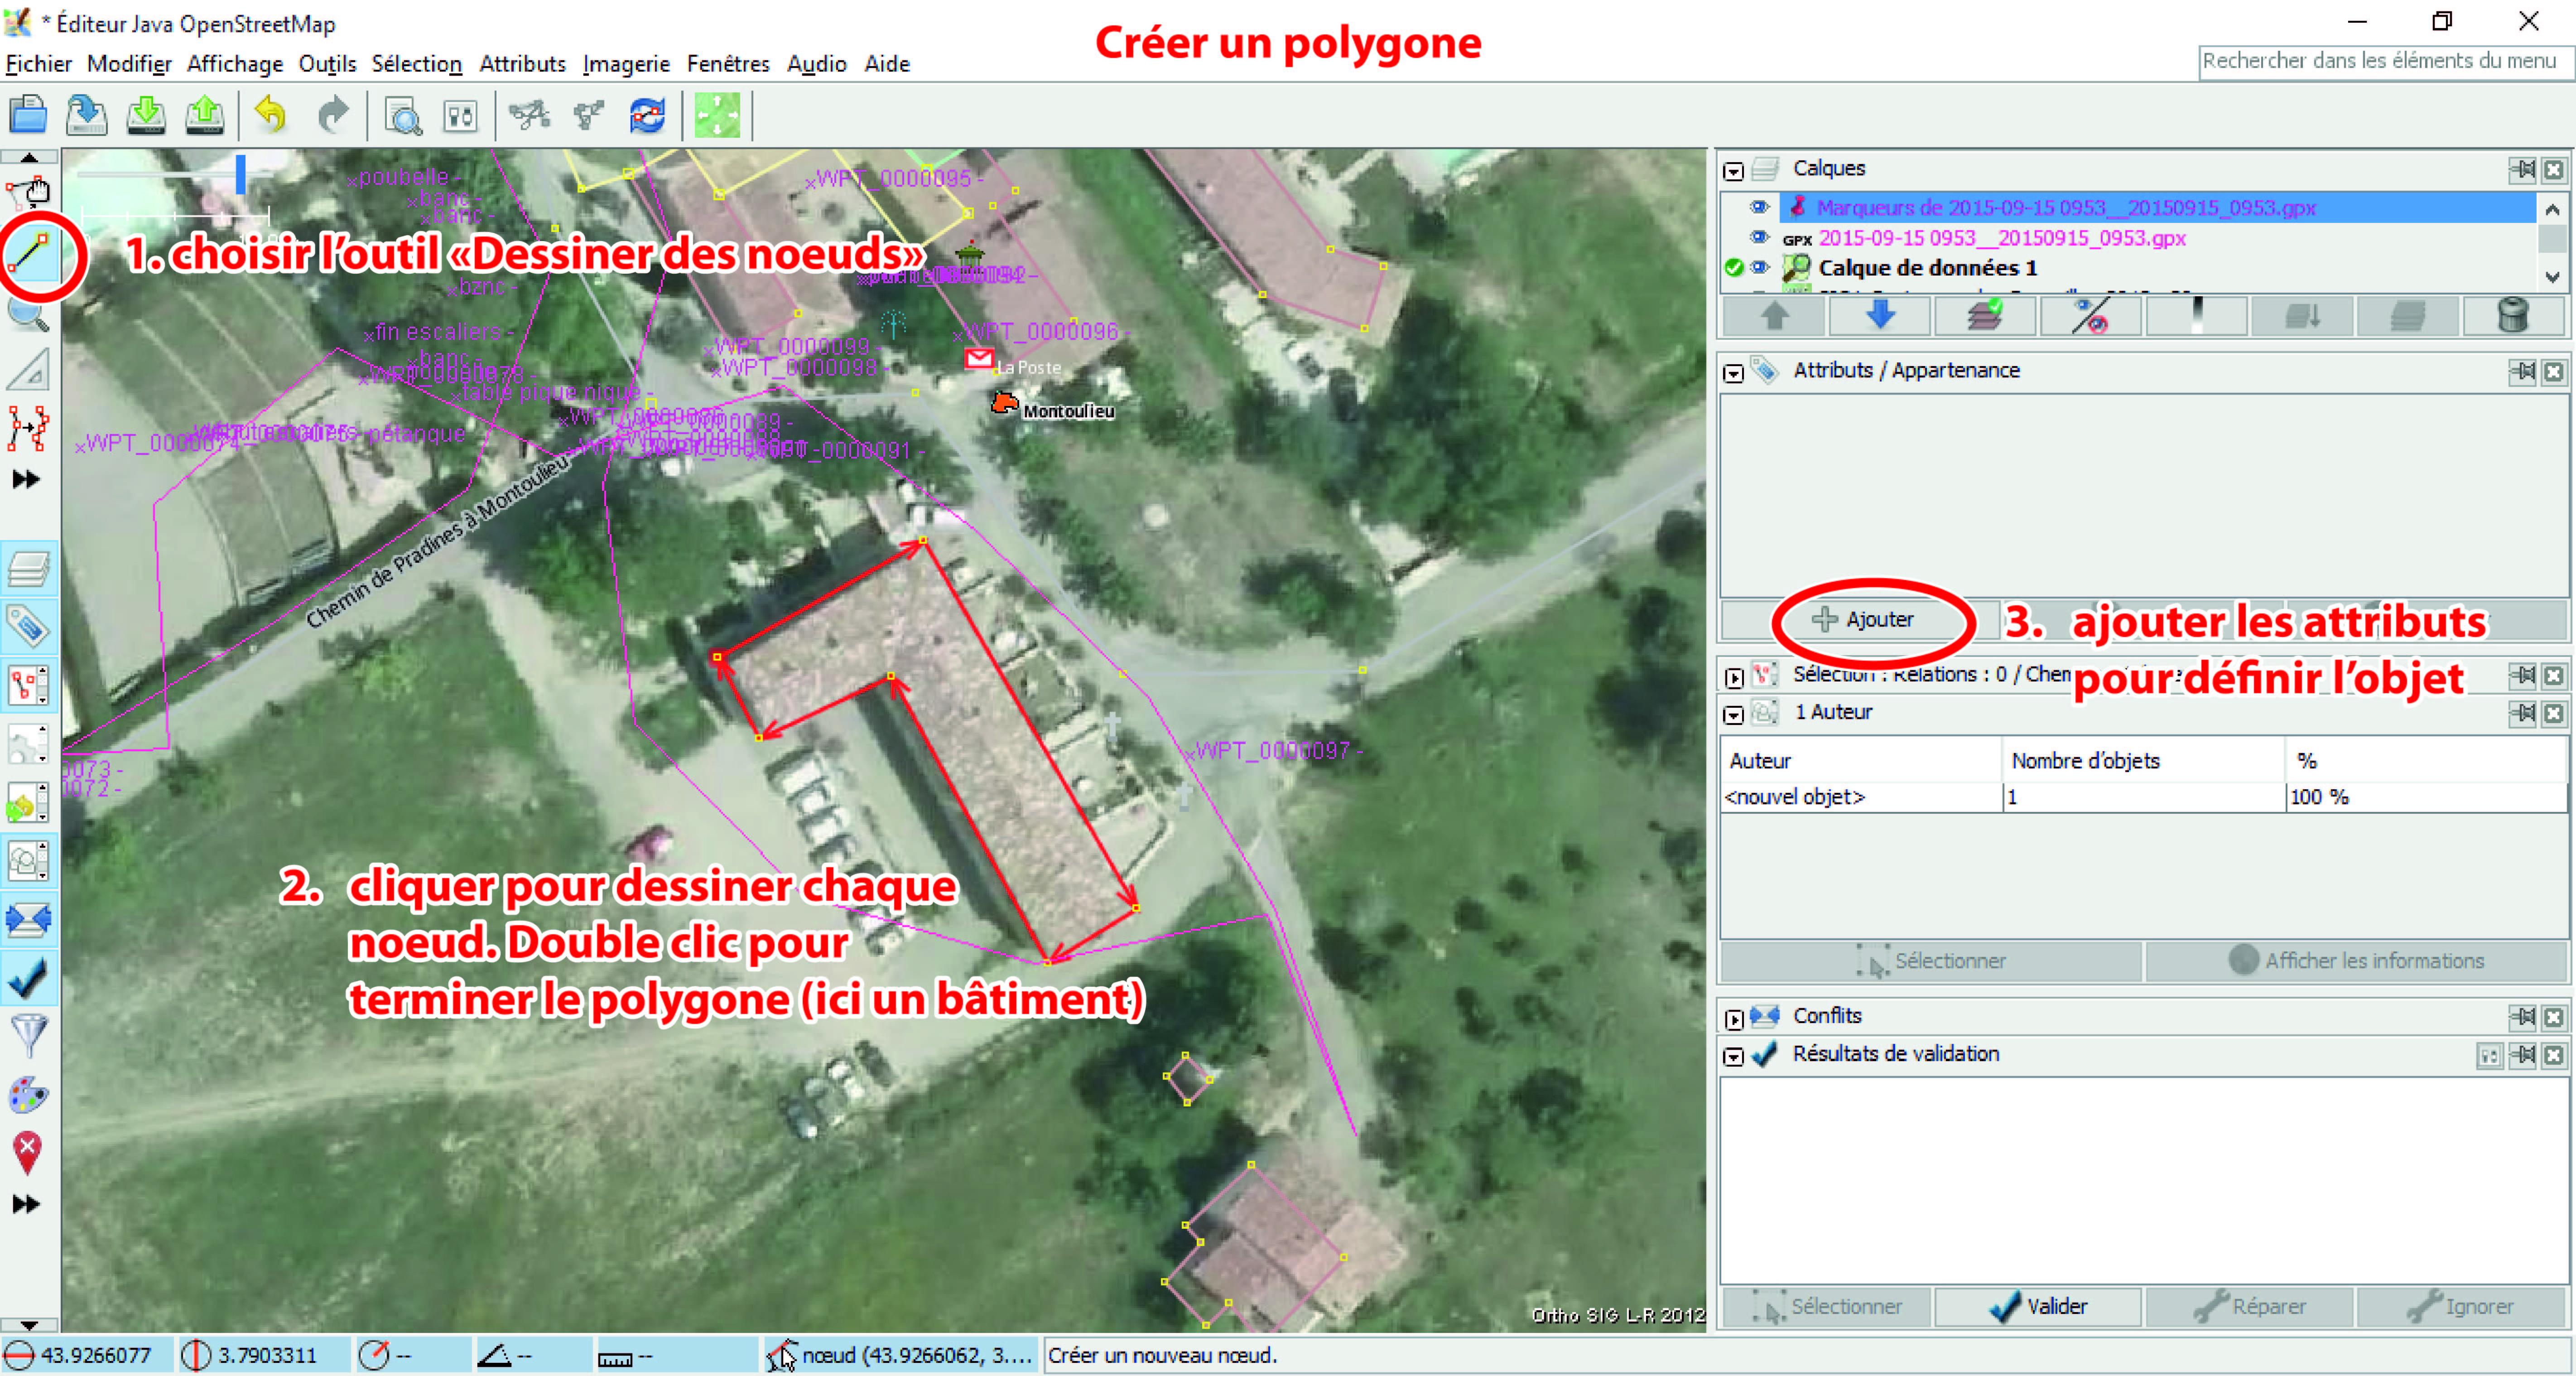 image TUTO_JOSM20.jpg (3.2MB)